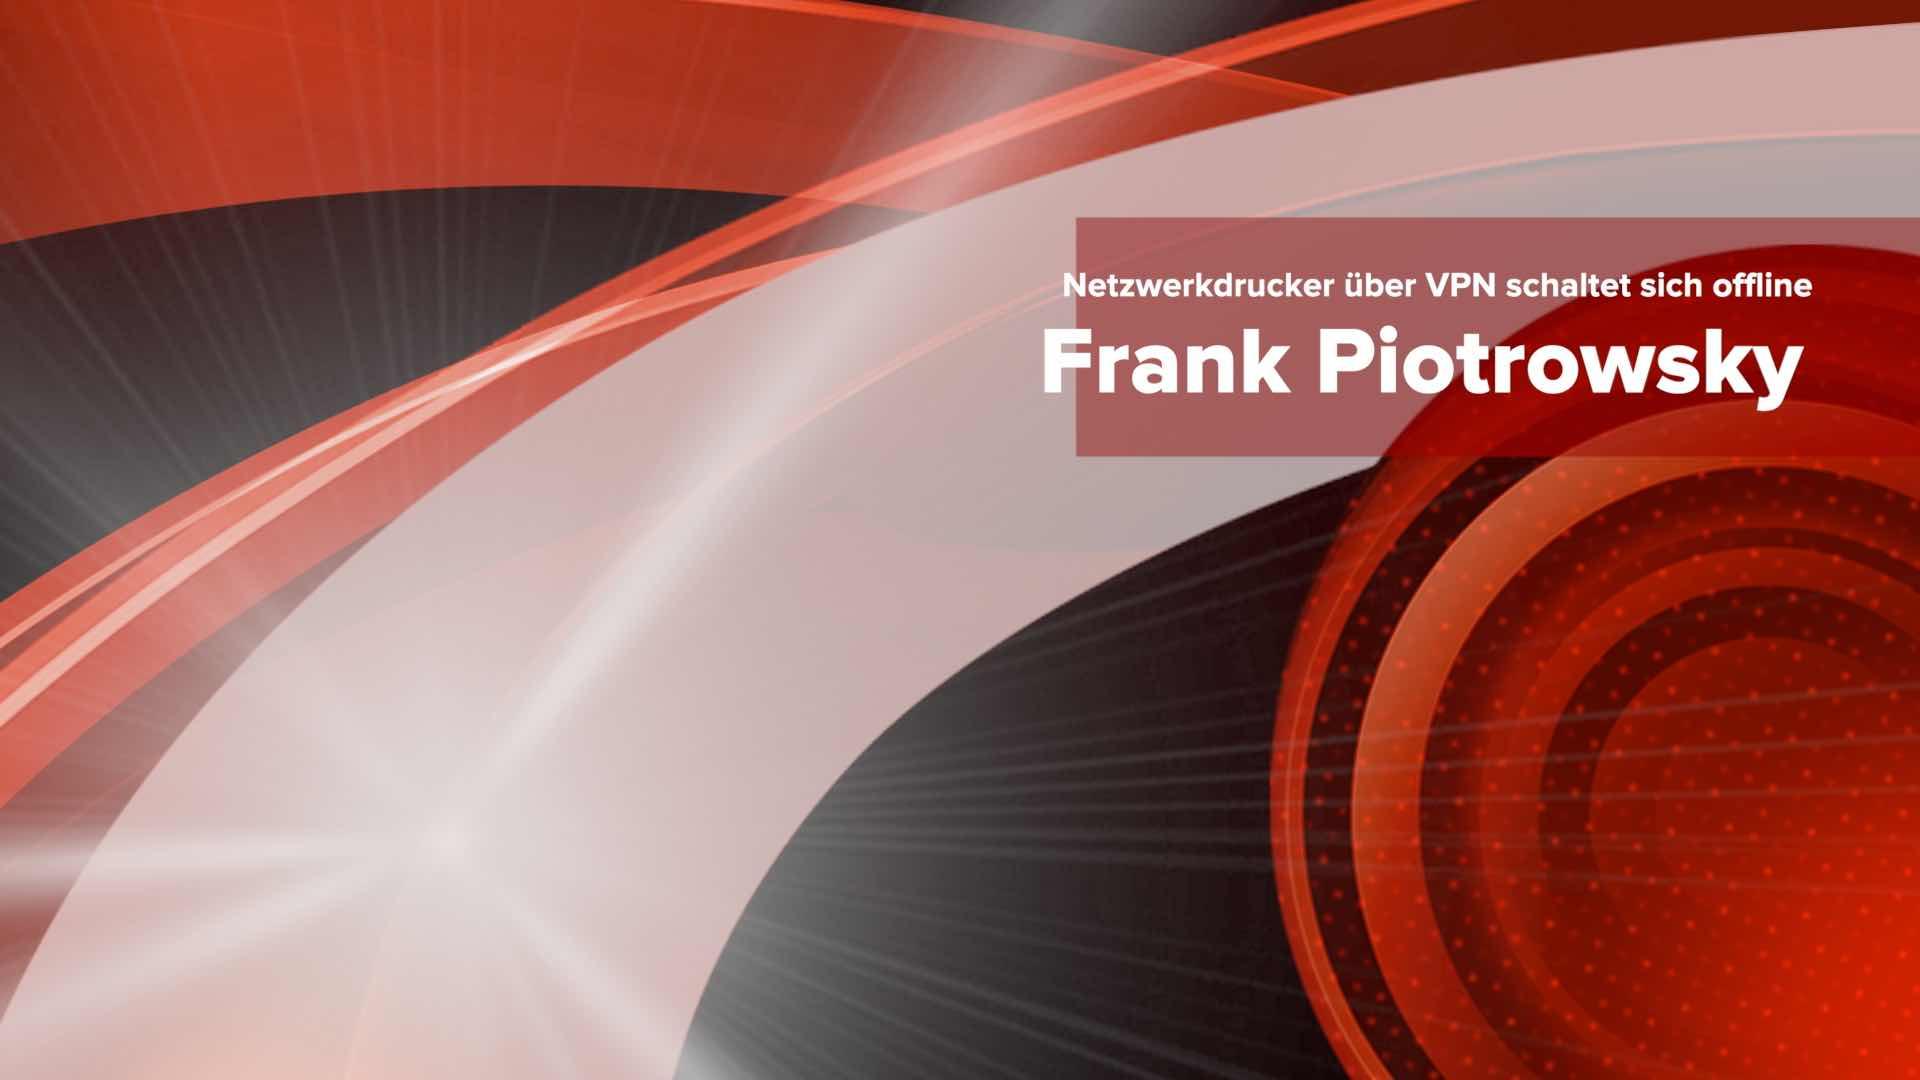 Netzwerkdrucker VPN offline